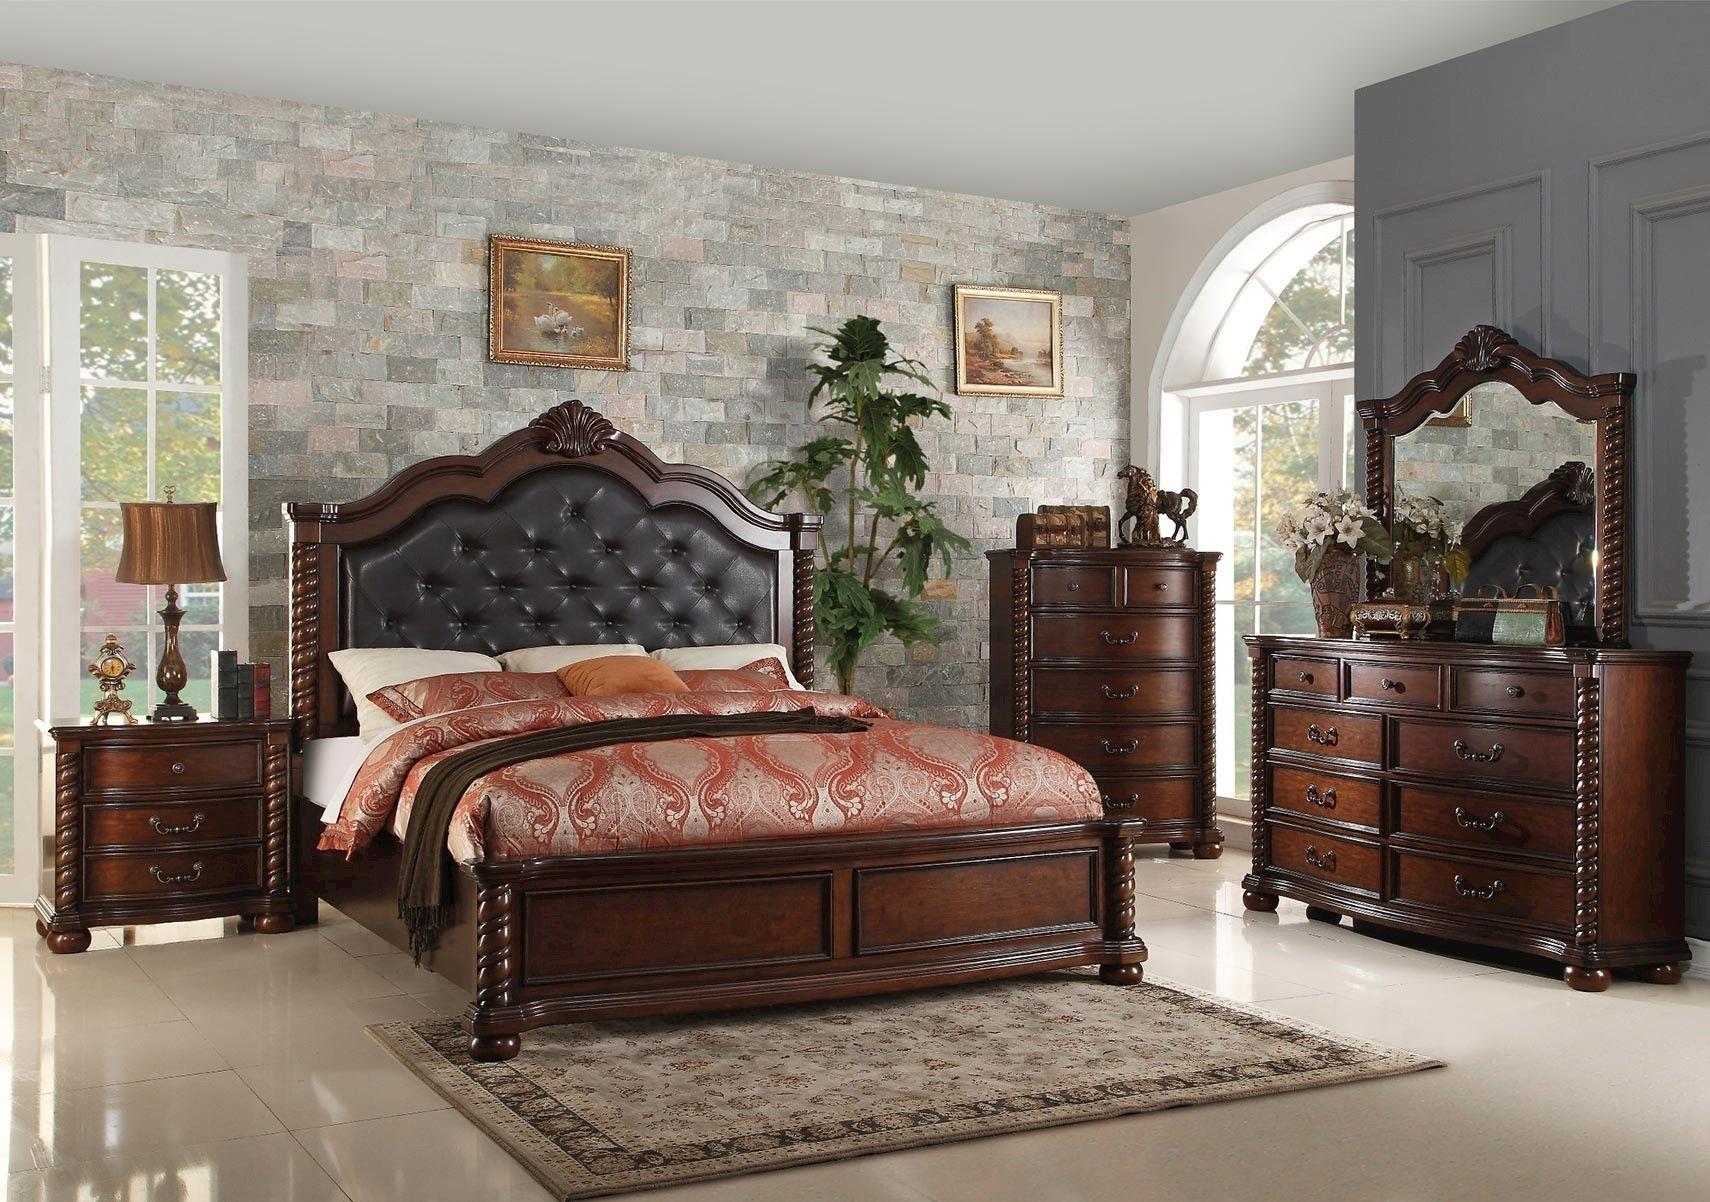 Lacks Montarosa 4 Pc Queen Bedroom Set Bedroom Furniture Sets